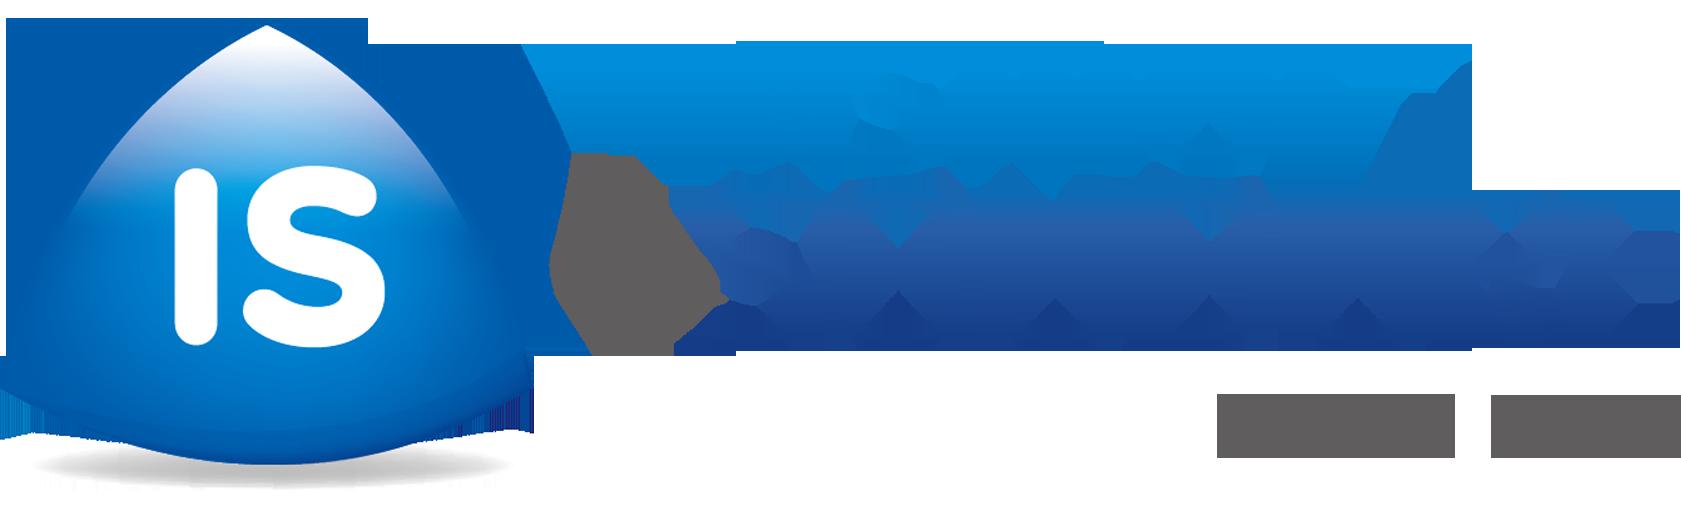 Logo Institut de soudure